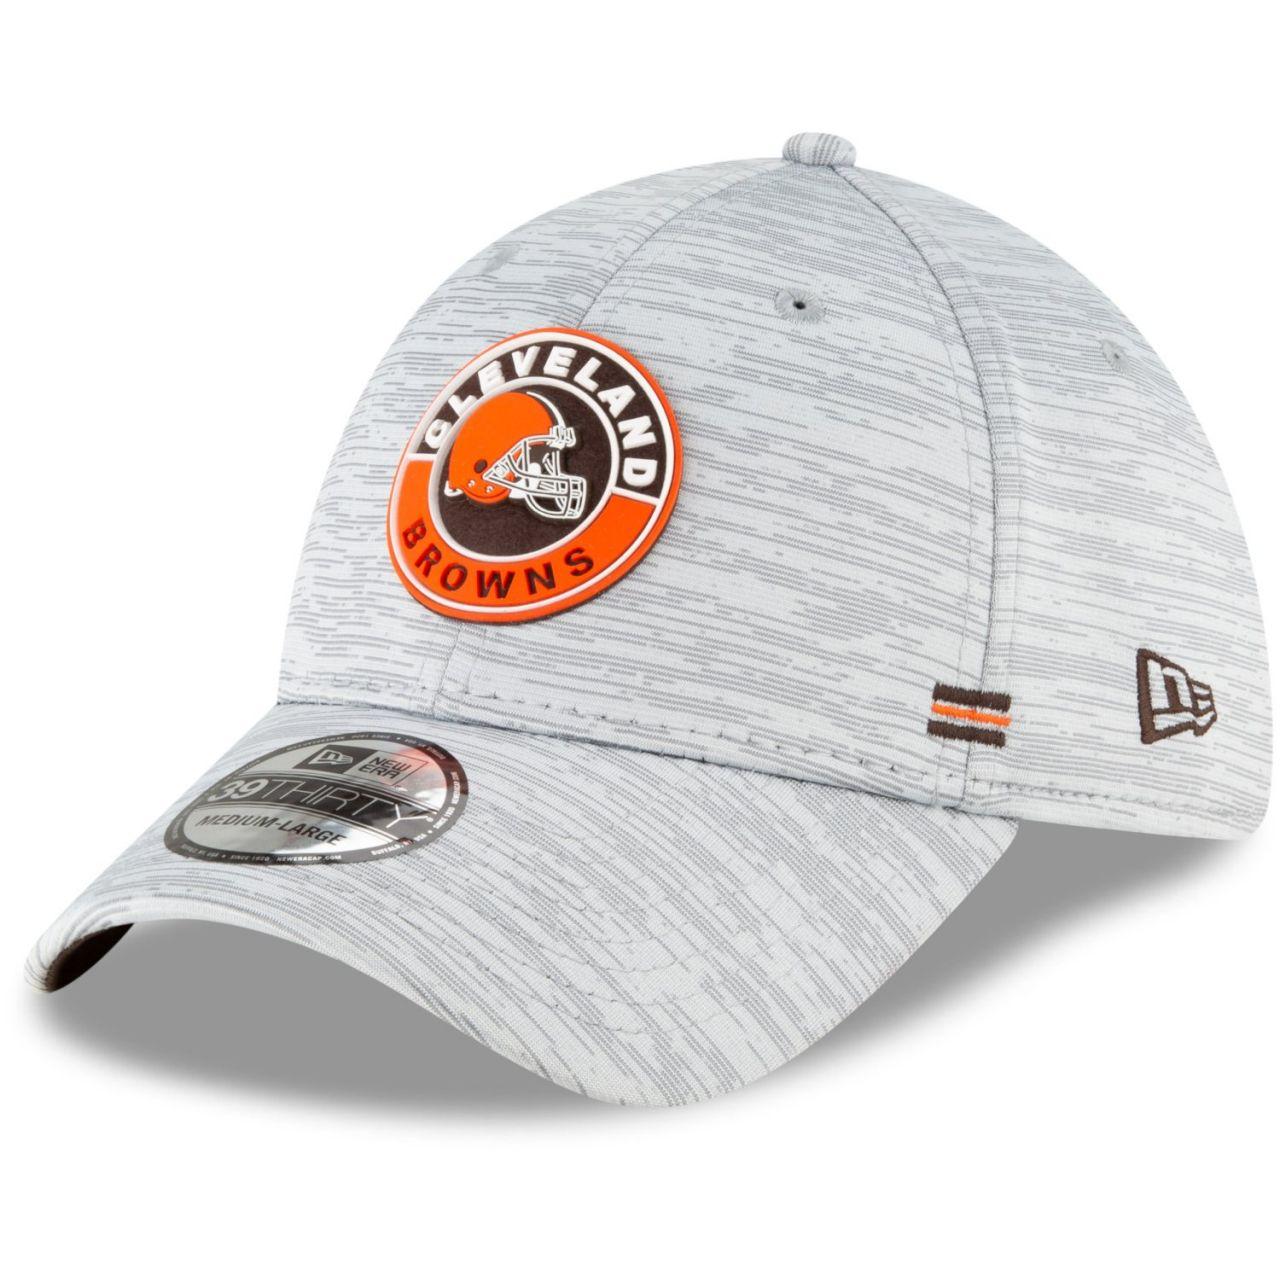 amfoo - New Era 39Thirty Cap - SIDELINE 2020 Cleveland Browns